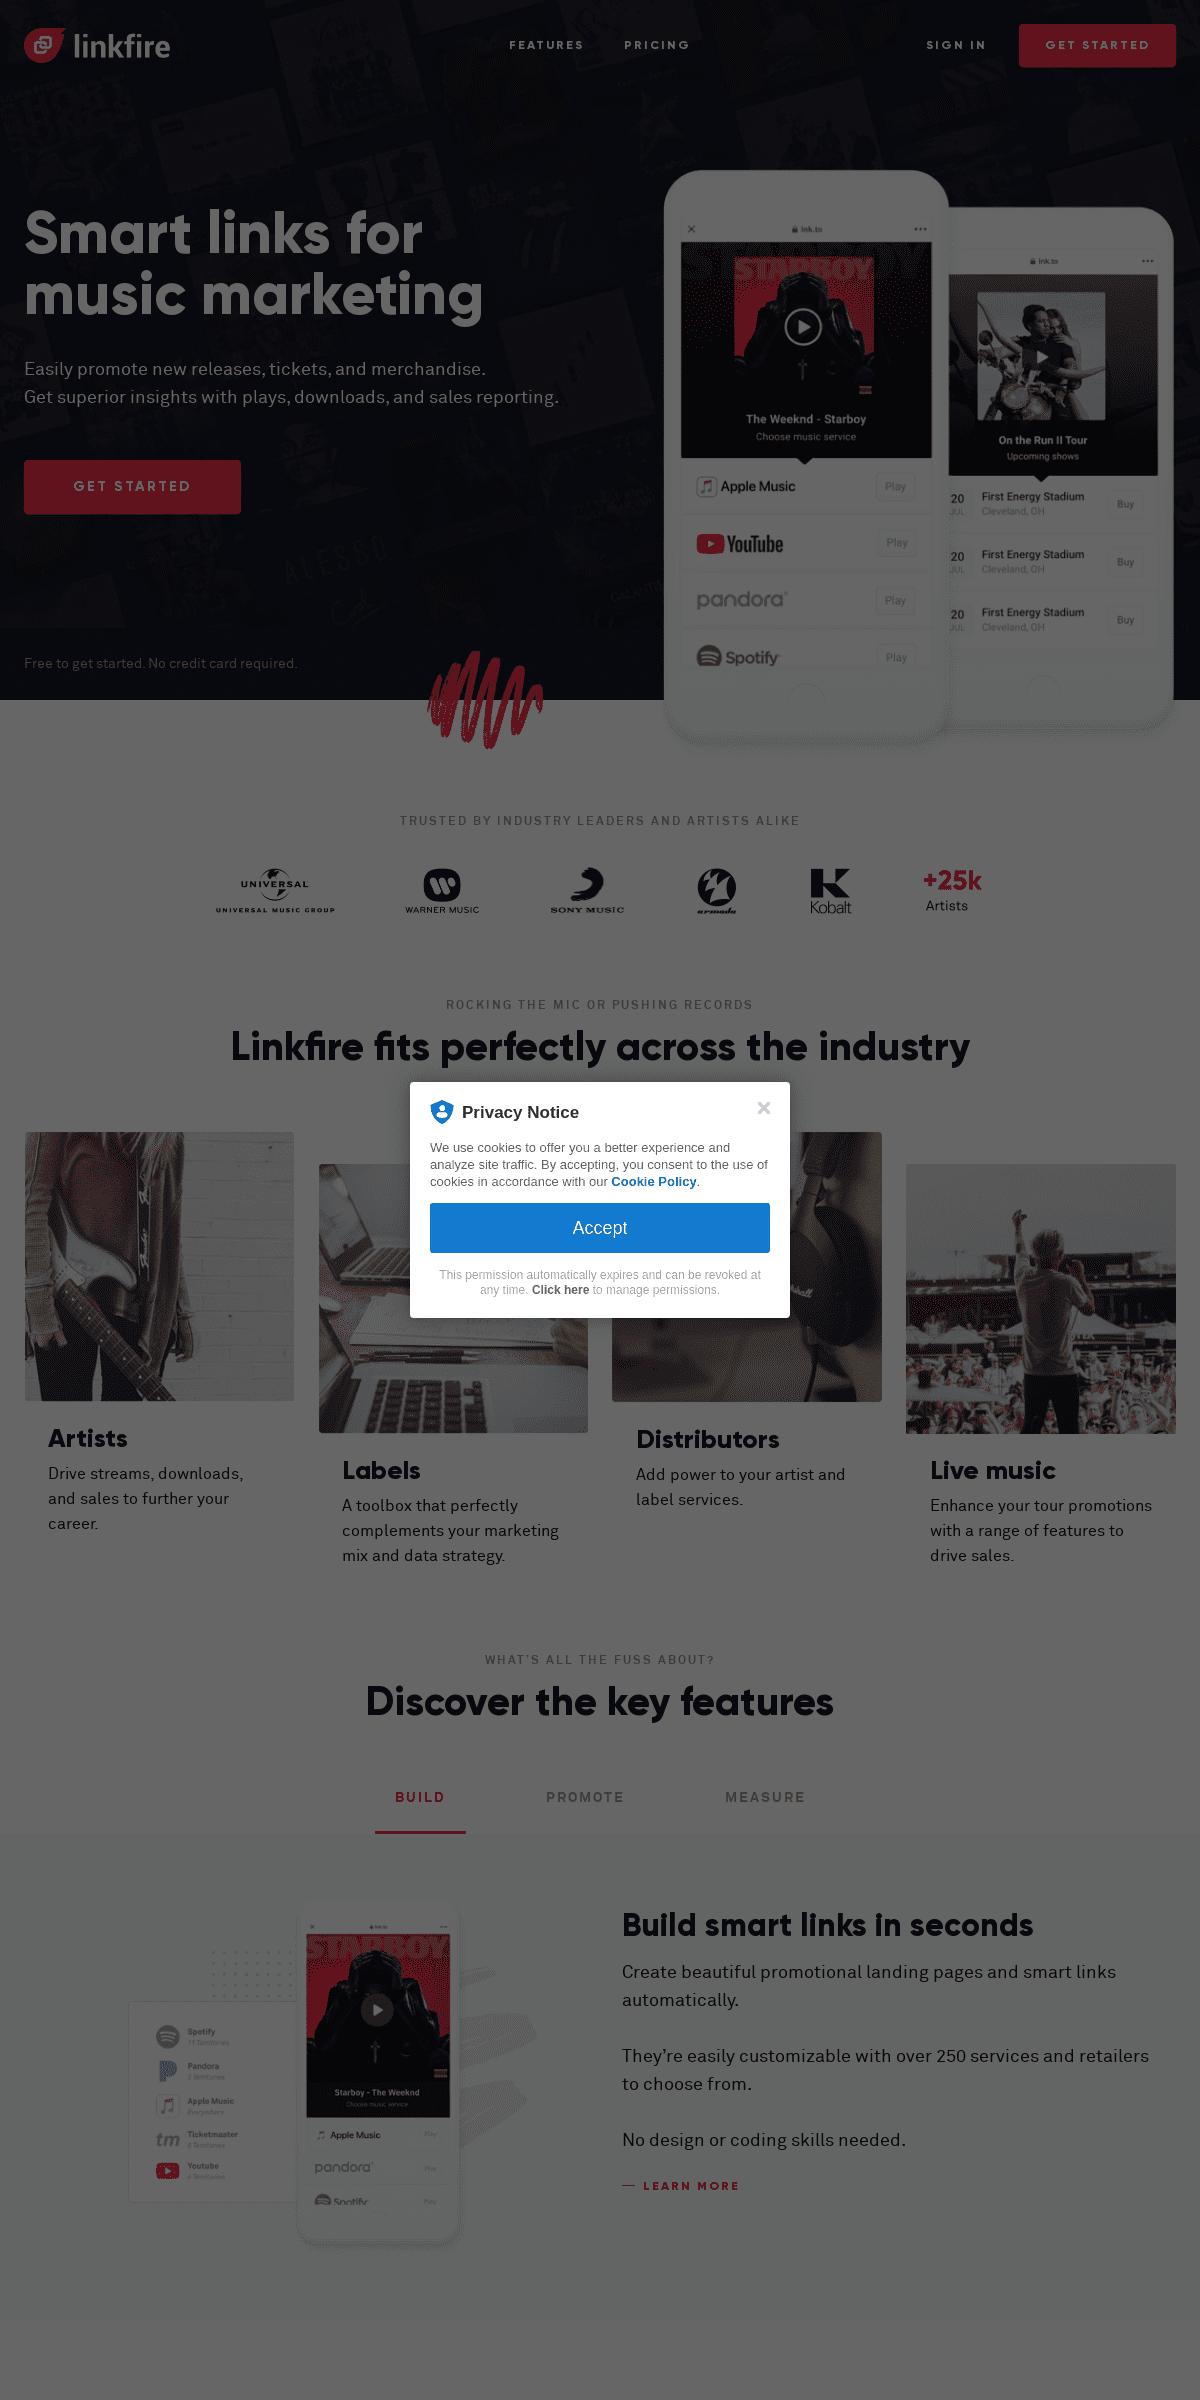 ArchiveBay.com - linkfire.com - Smart links for music marketing, artist marketing, and tours promotion